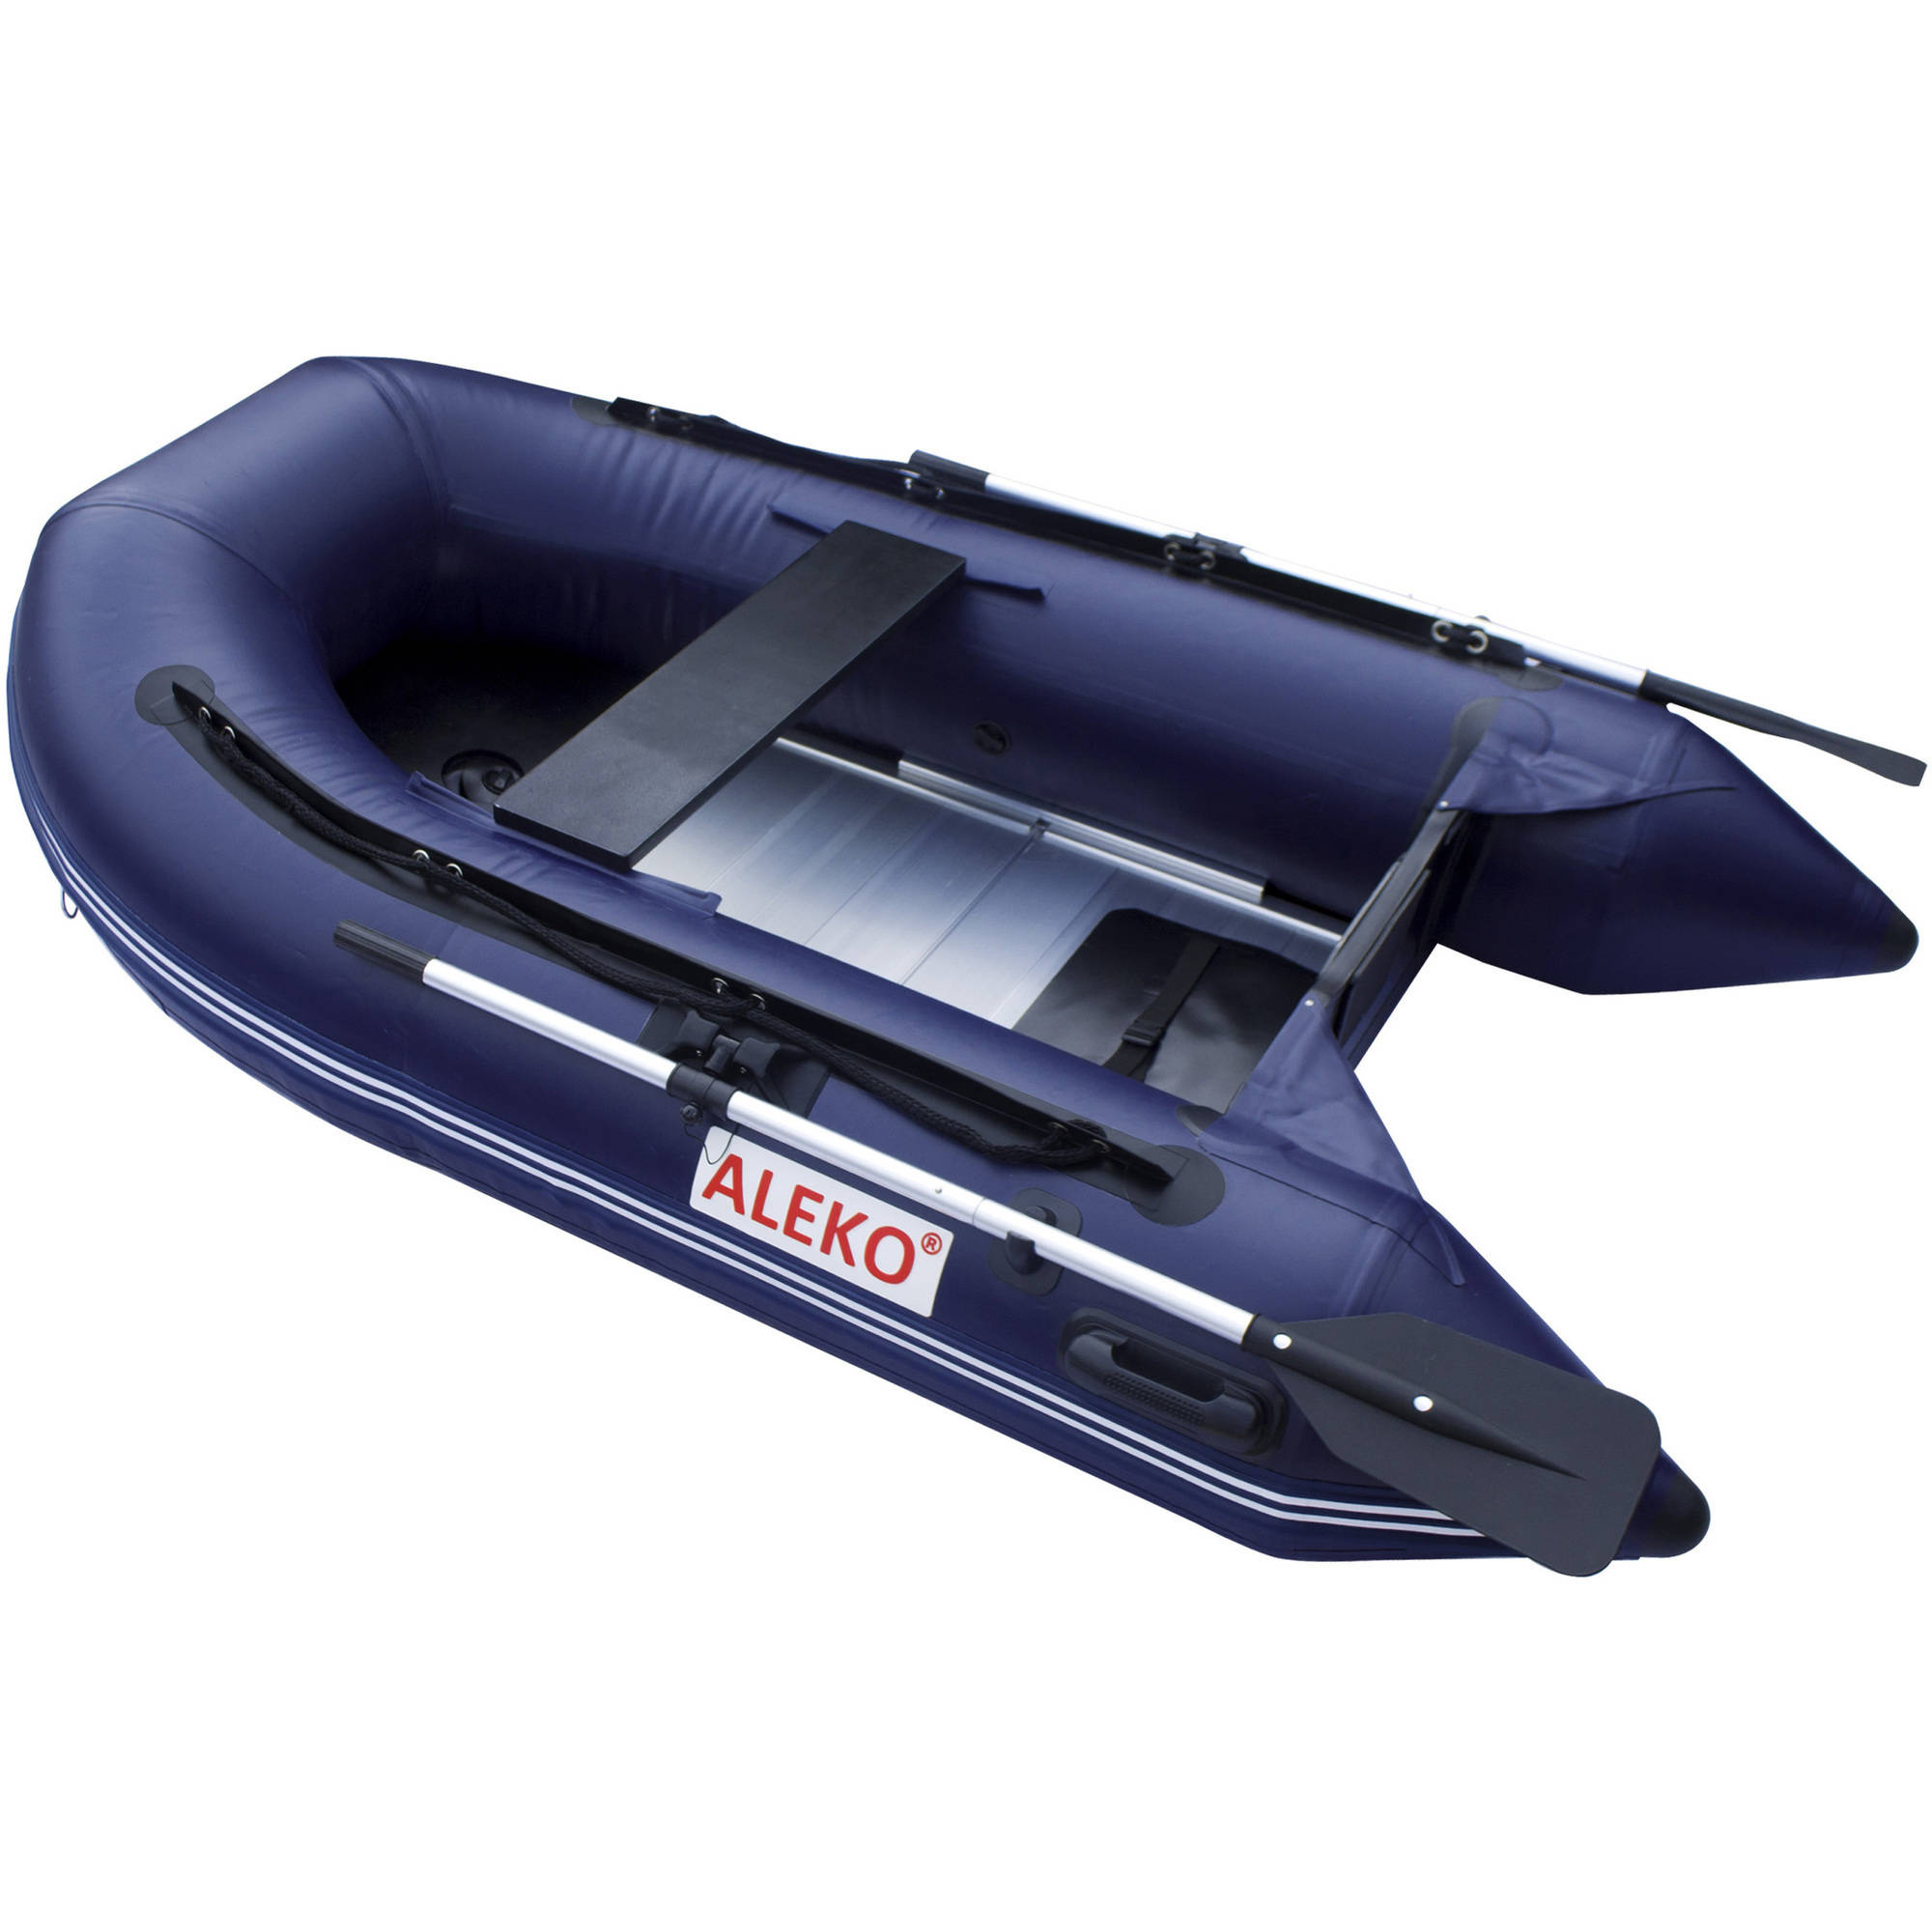 ALEKO Inflatable Boat - Aluminum Floor - 8.4 Feet - Blue